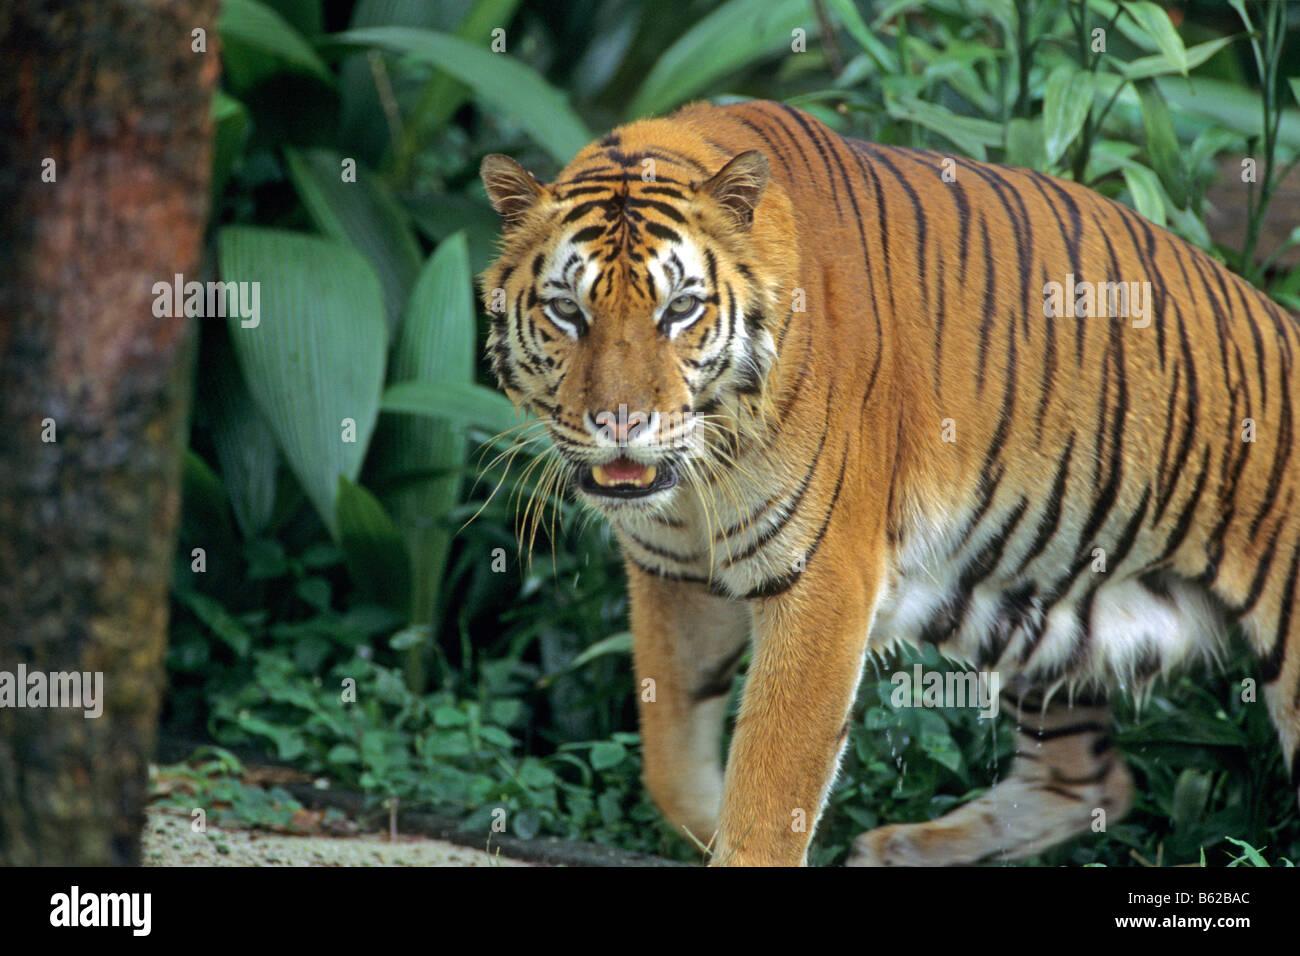 Tigre de Sumatra (Panthera tigris sumatrae) caminar en la selva Imagen De Stock